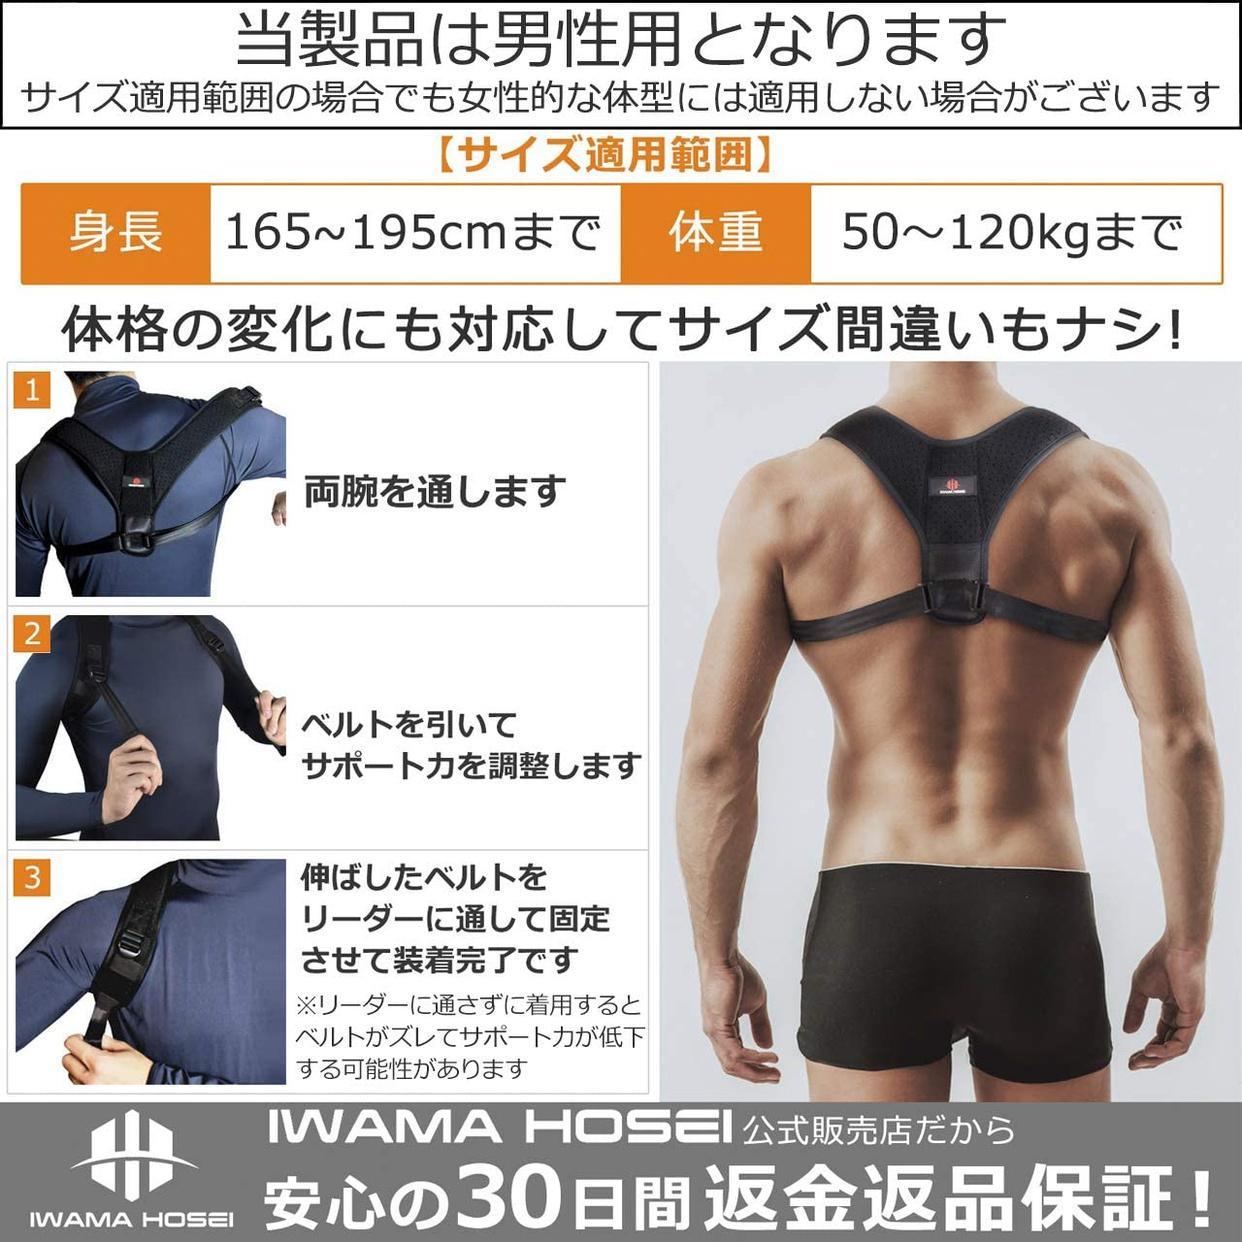 IWAMA HOSEI(イワマホウセイ) 姿勢サポーターの商品画像7